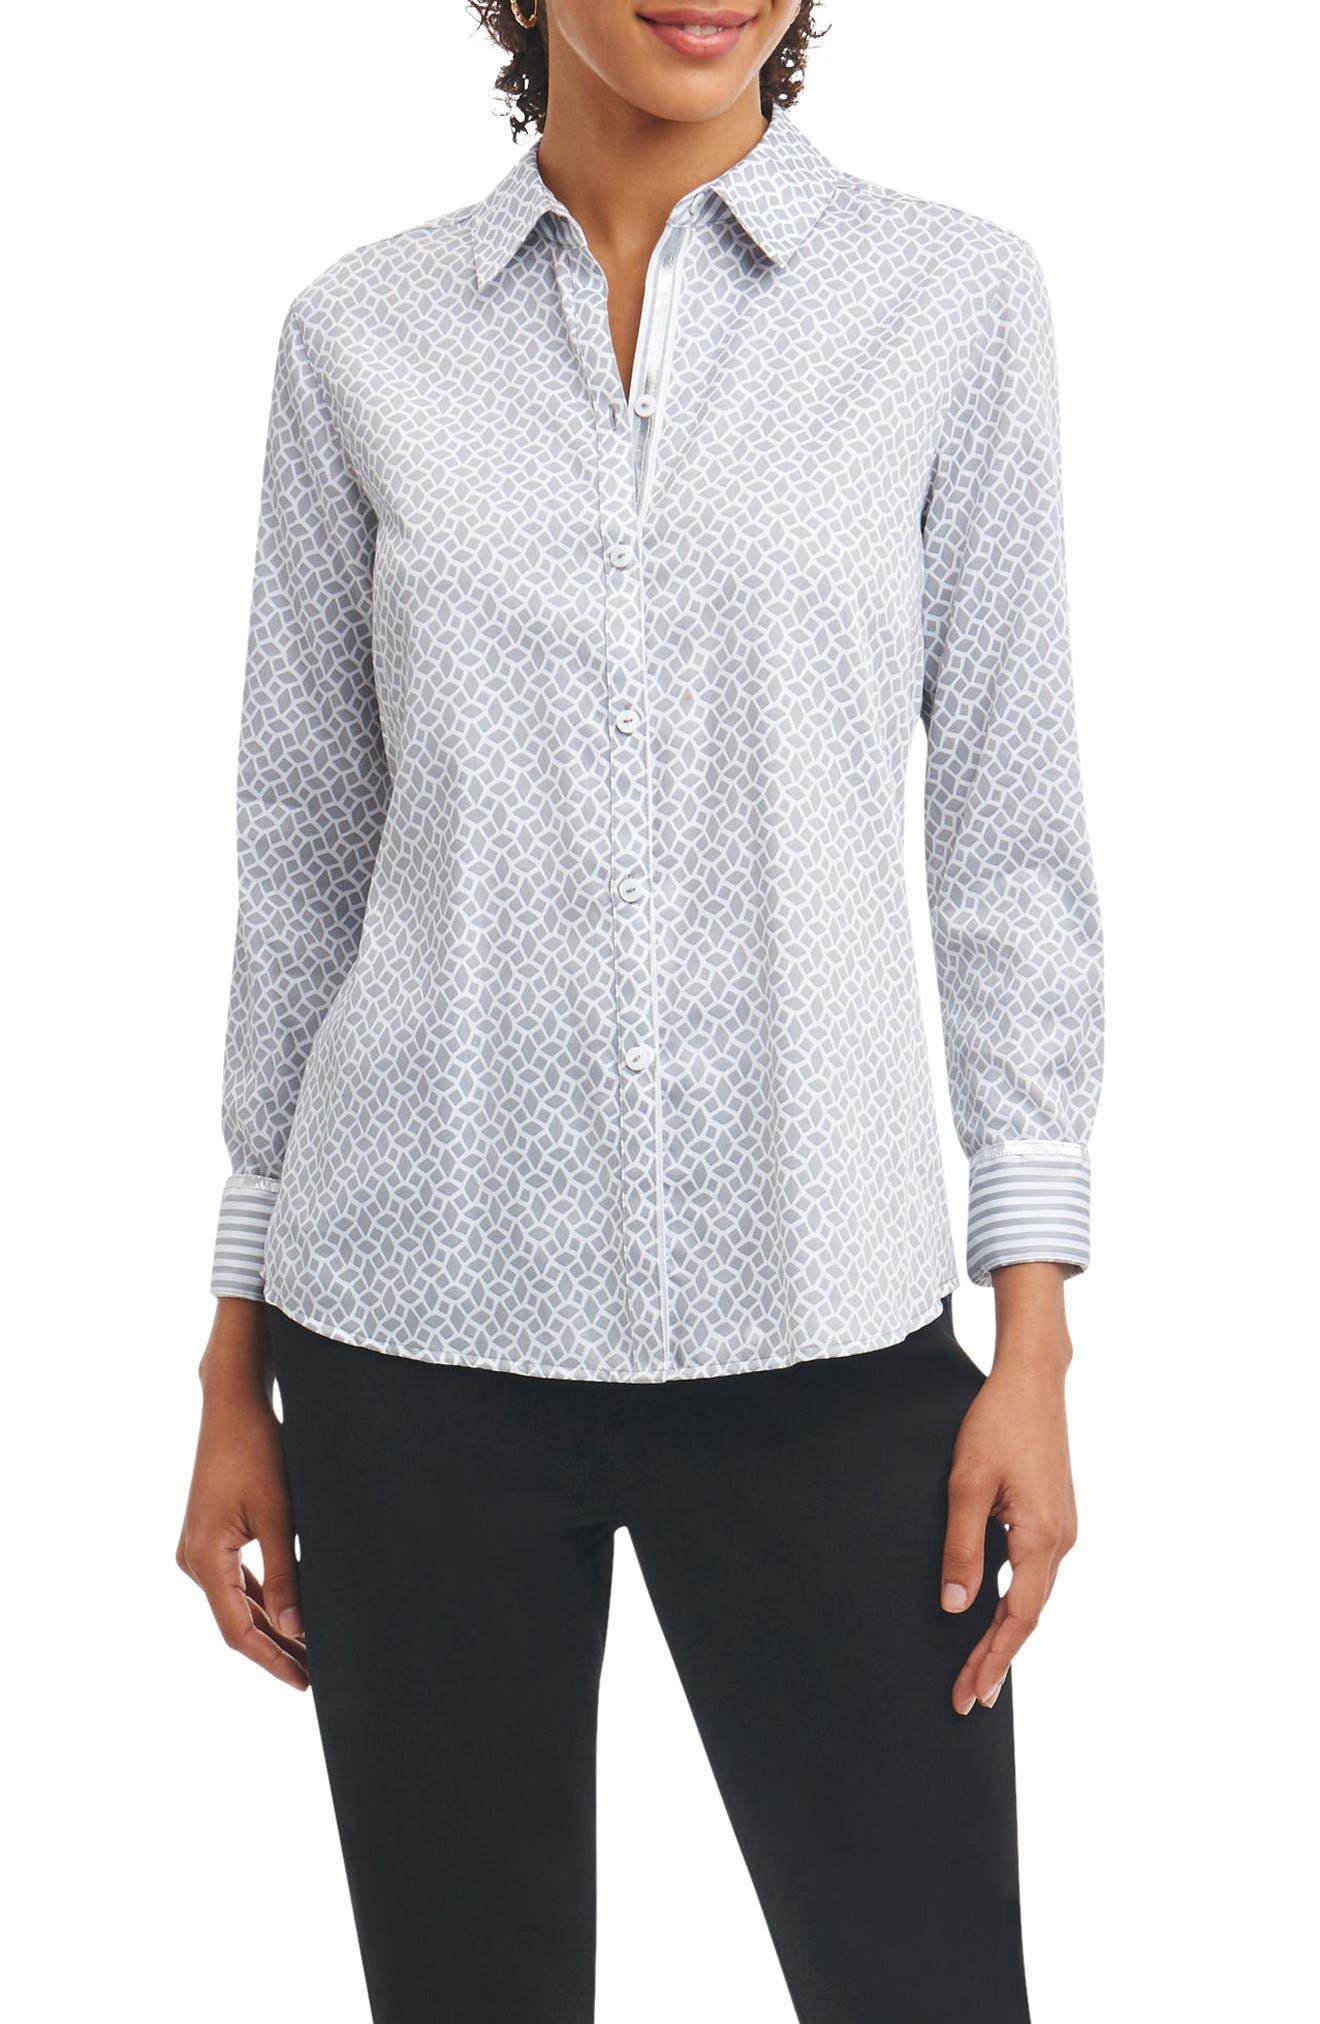 Main Image - Foxcroft Ava Wrinkle Free Geo Print Shirt